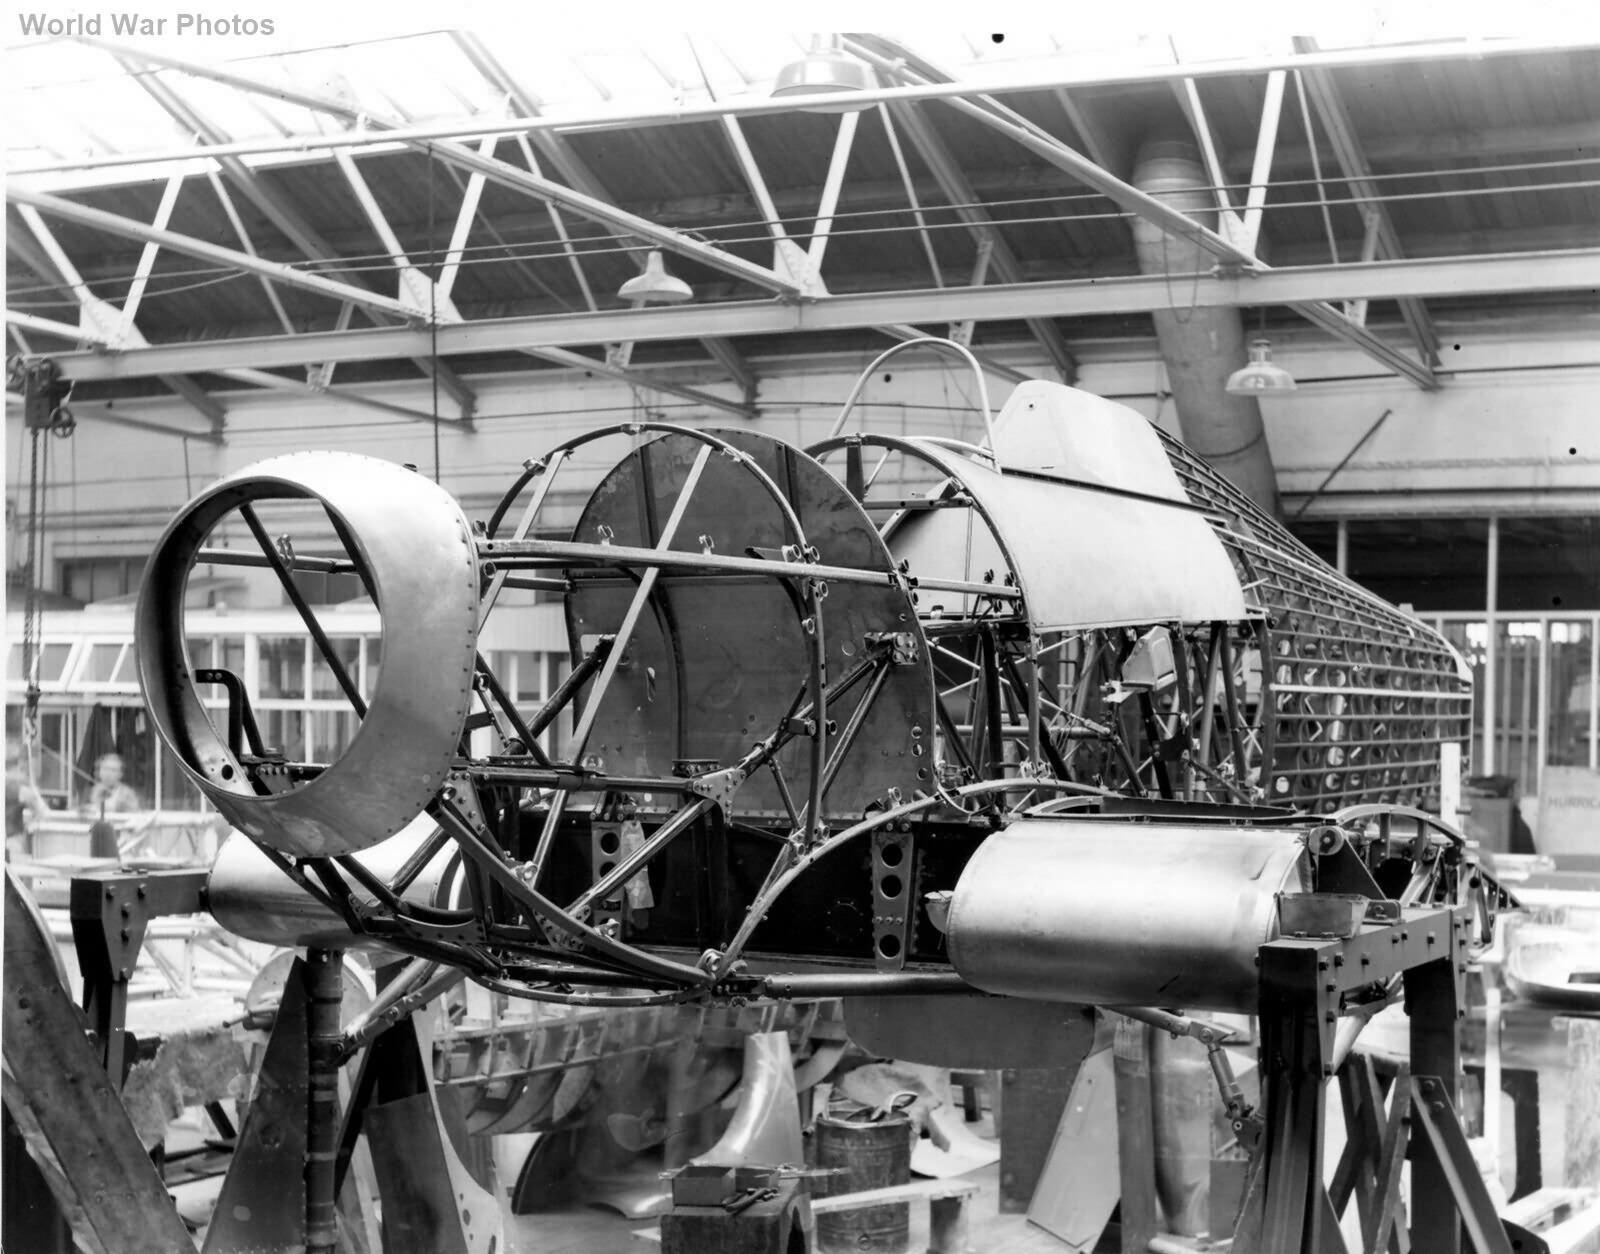 Hawker Hurricane production